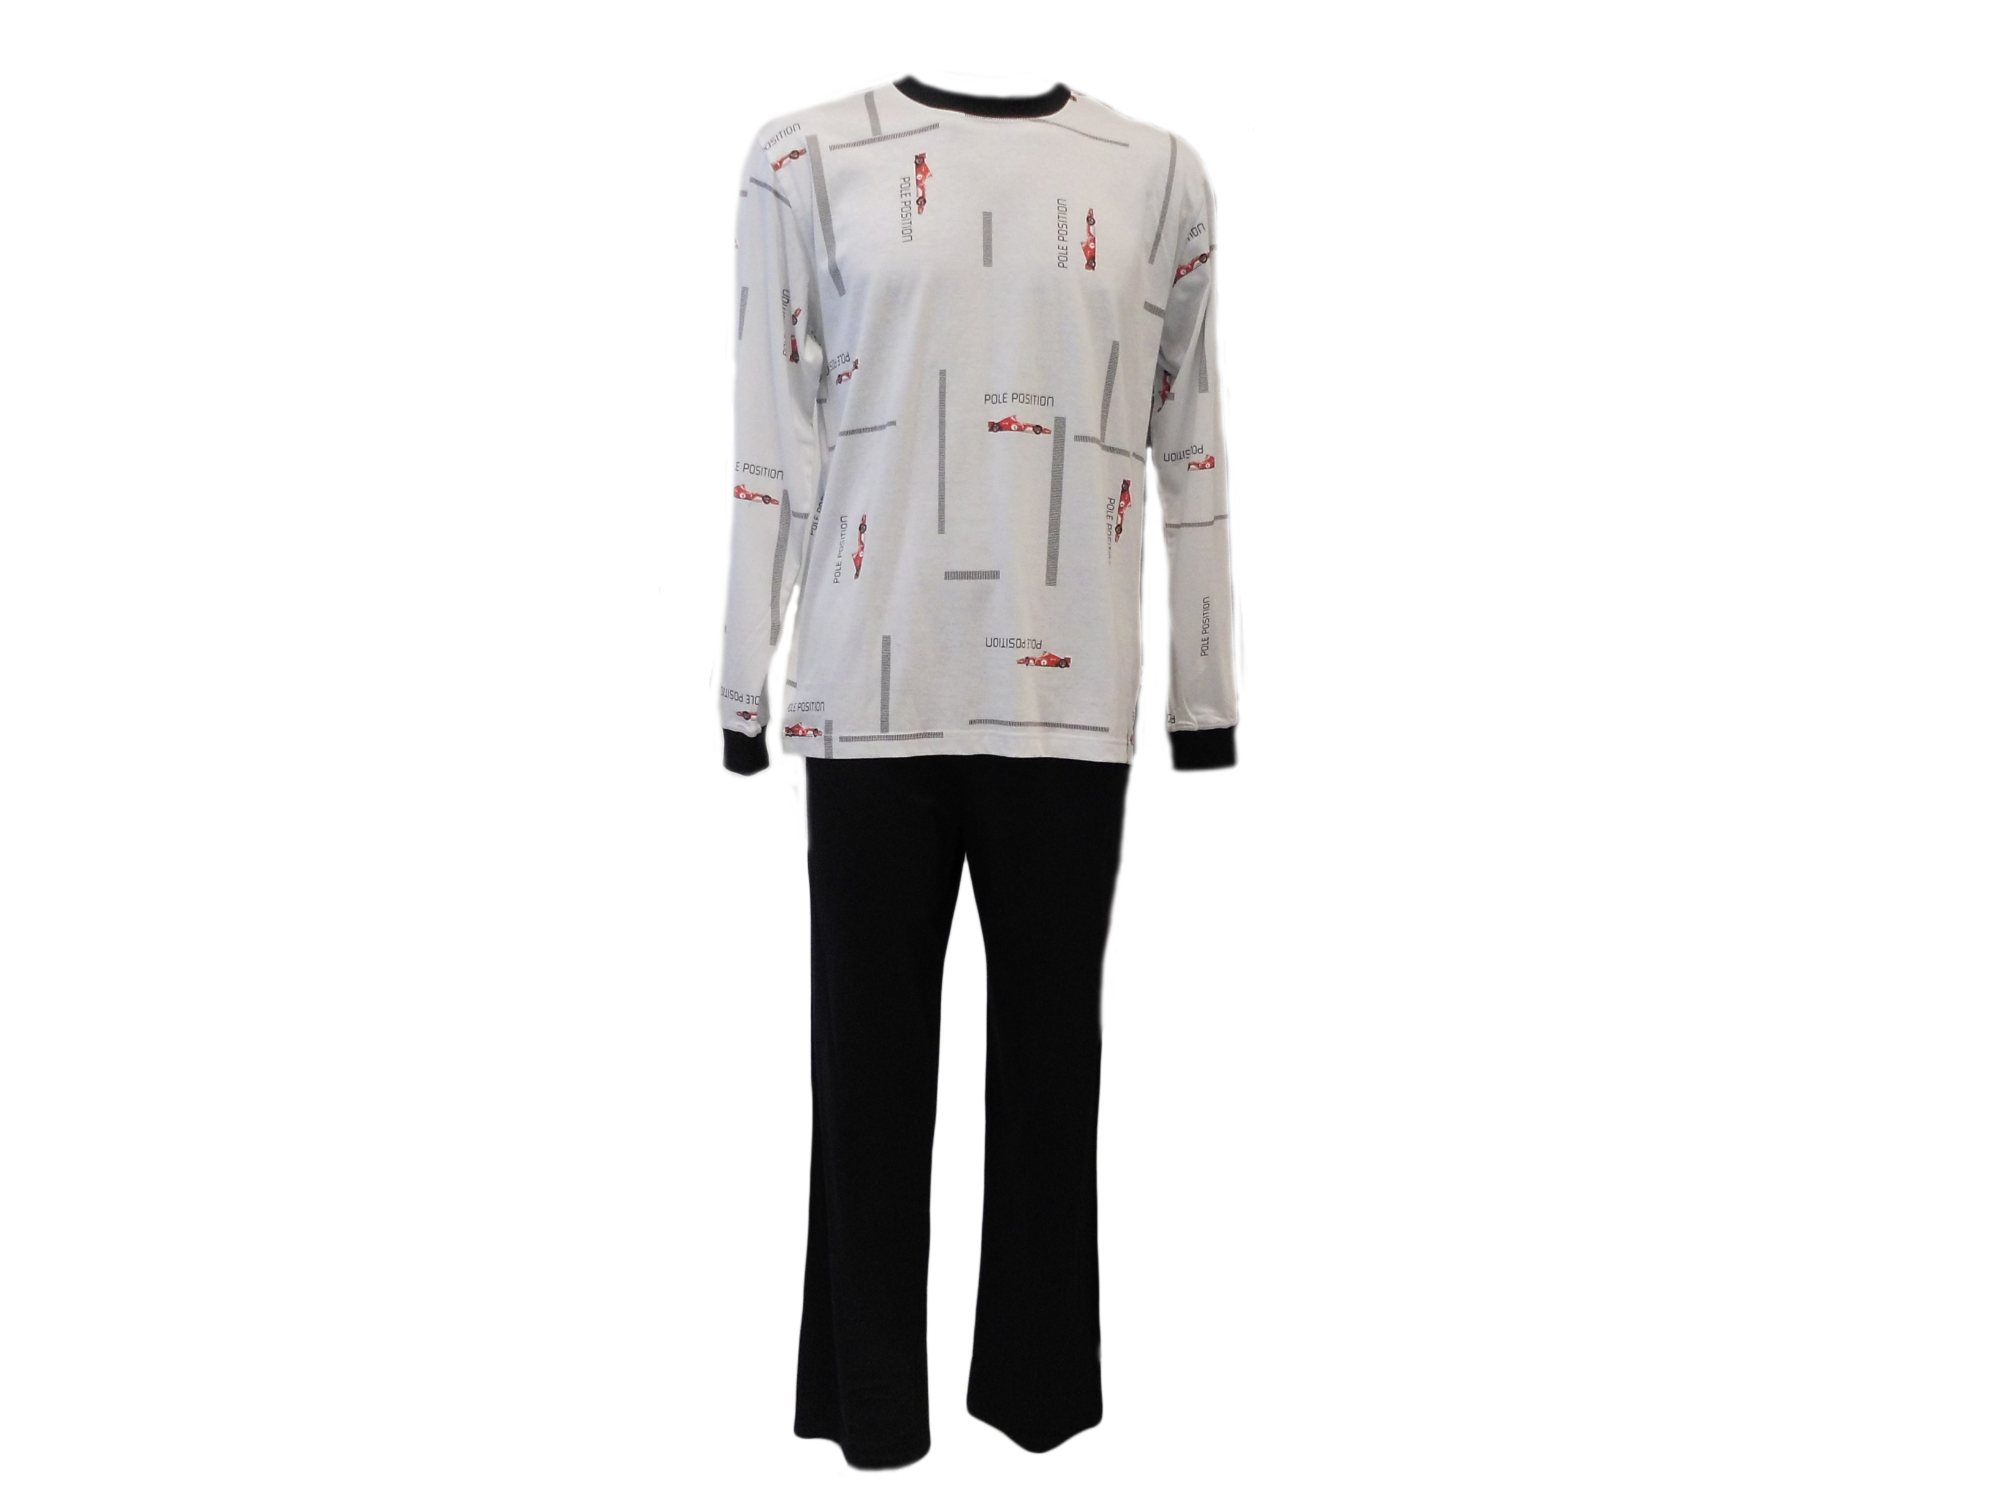 Pánské pyžamo Lu Saly 4 Dr - Favab Barva: bílá, Velikost: L